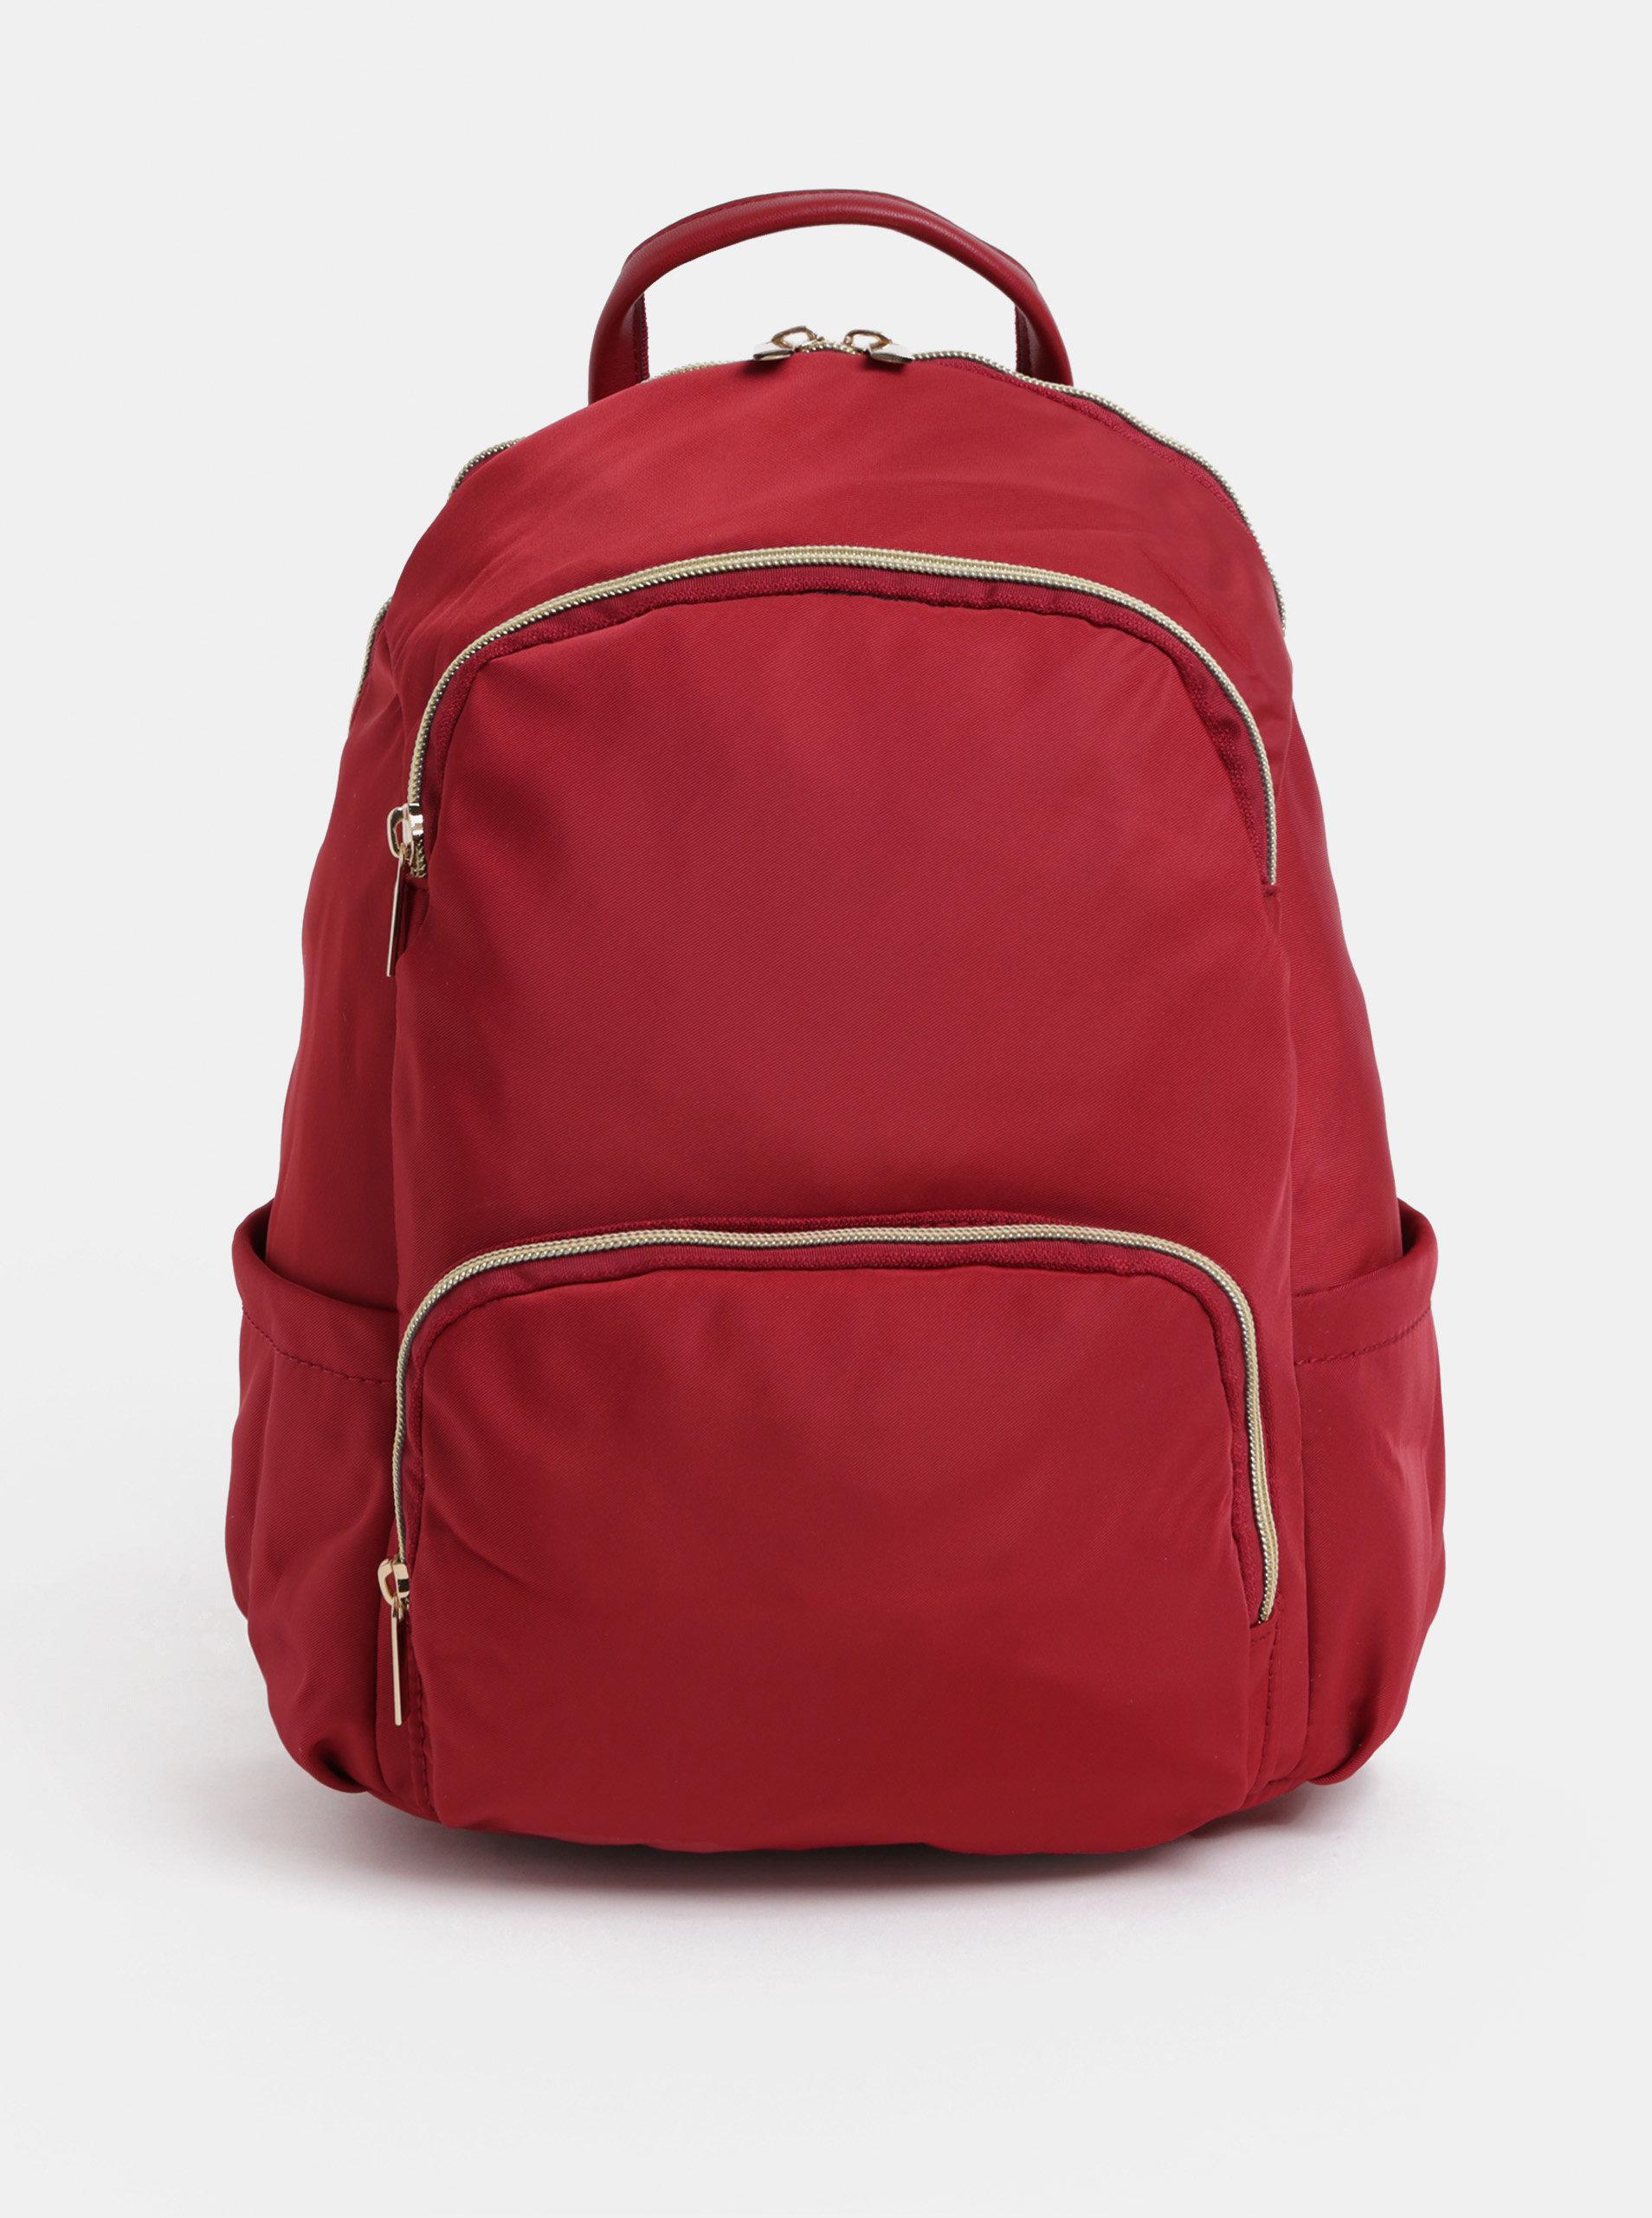 Červený batoh so zipsami v zlatej farbe ZOOT ... 622d010f9e3